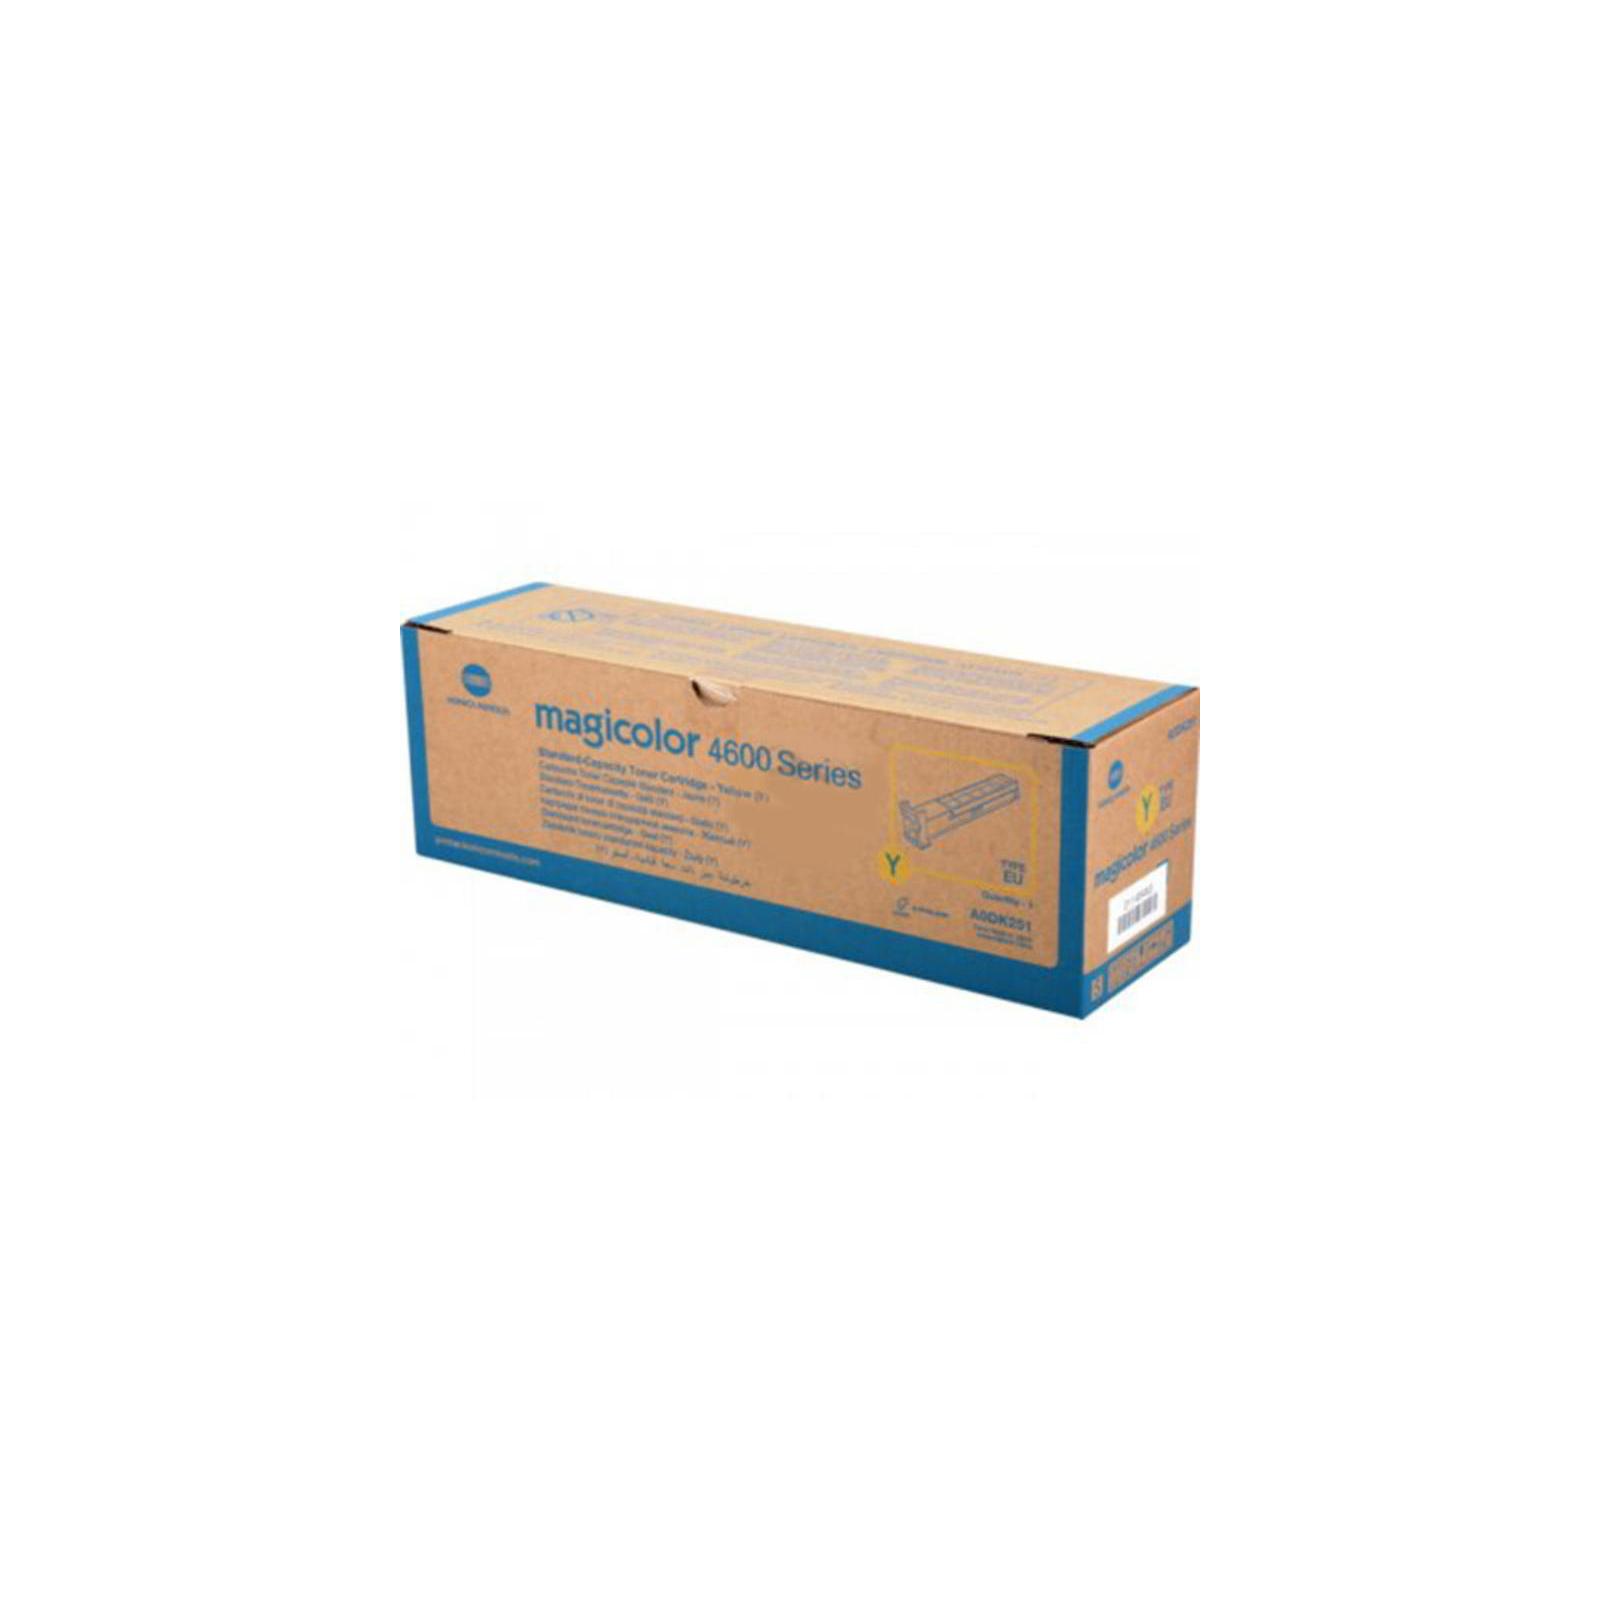 Тонер-картридж KONICA MINOLTA MagiColor 4600 Series (yellow) 4К (A0DK251)